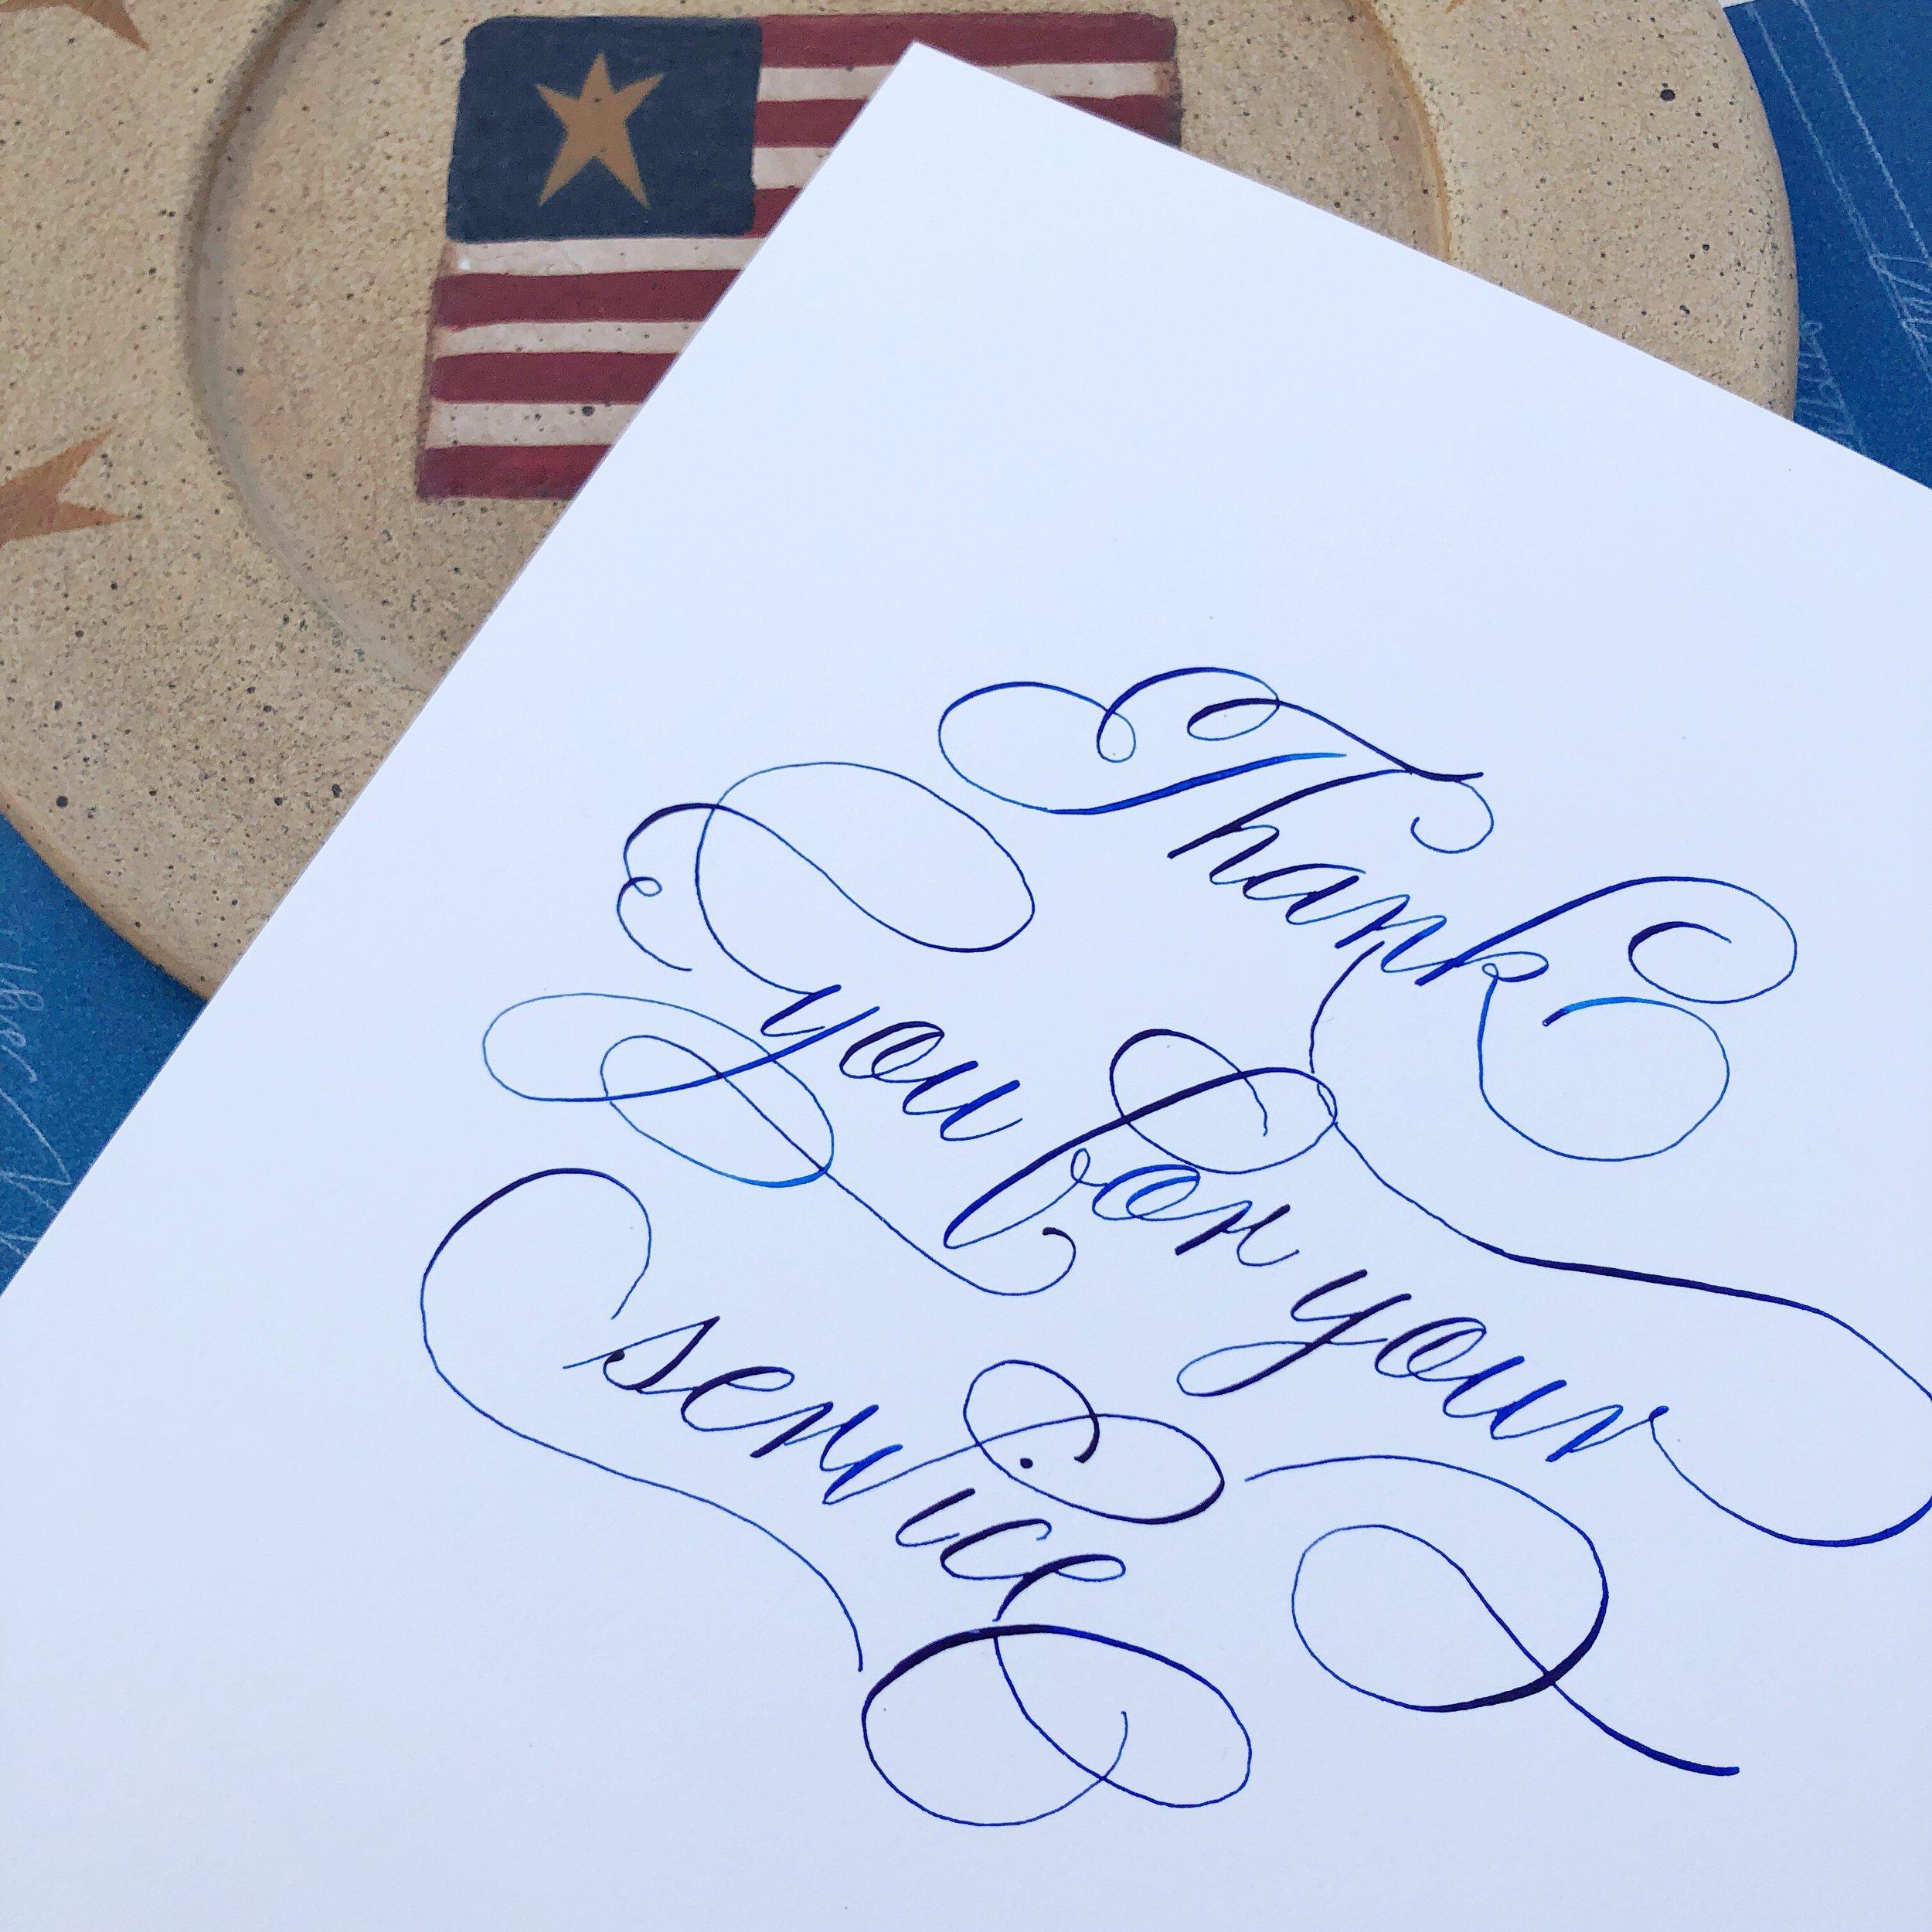 Central PA, York PA, JesSmith Designs, custom, wedding, invitations, bridal, announcements, save the date, baby, hanover, calligraphy, baltimore, wedding invitations, lancaster, gettysburg-03-10 07.57.11.jpg